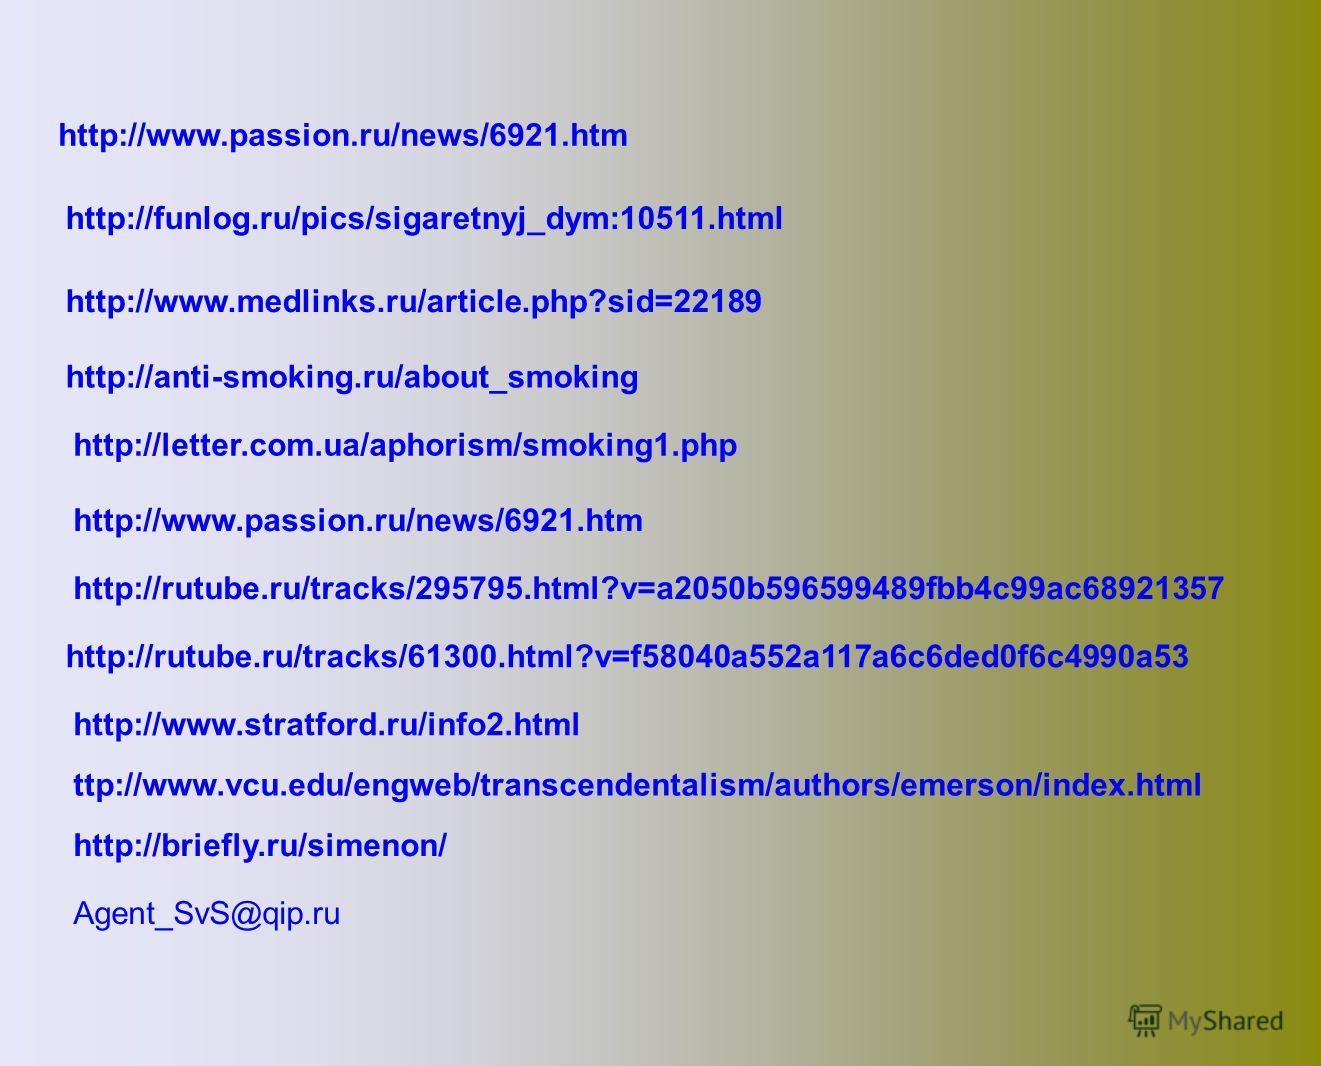 http://www.passion.ru/news/6921.htm http://funlog.ru/pics/sigaretnyj_dym:10511.html http://www.medlinks.ru/article.php?sid=22189 http://anti-smoking.ru/about_smoking http://letter.com.ua/aphorism/smoking1.php http://www.passion.ru/news/6921.htm http: